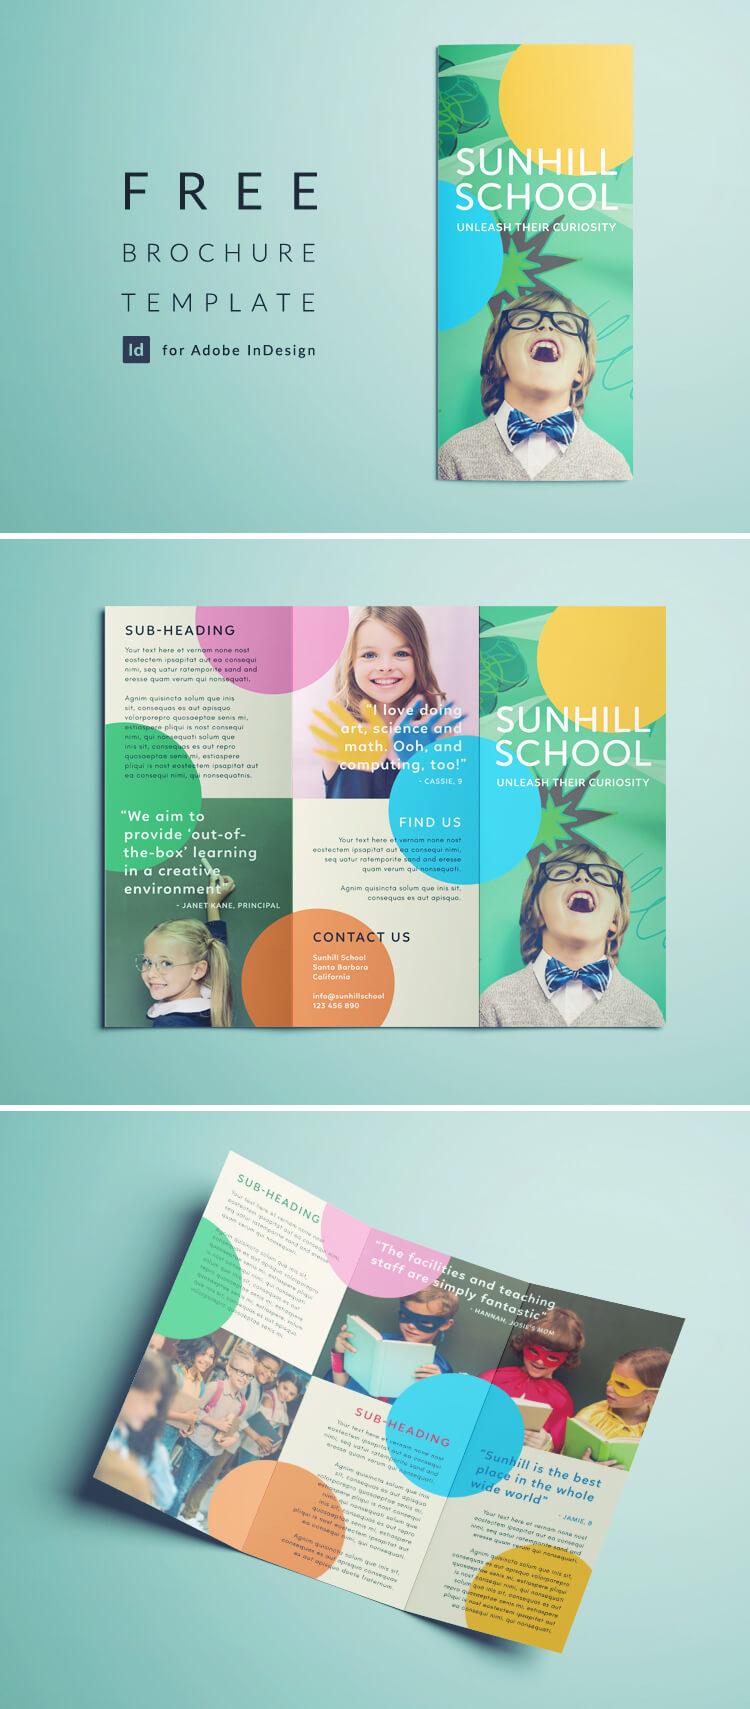 Free School Brochure Template - Tri-fold Colorful Brochure Template for InDesign - Free Download